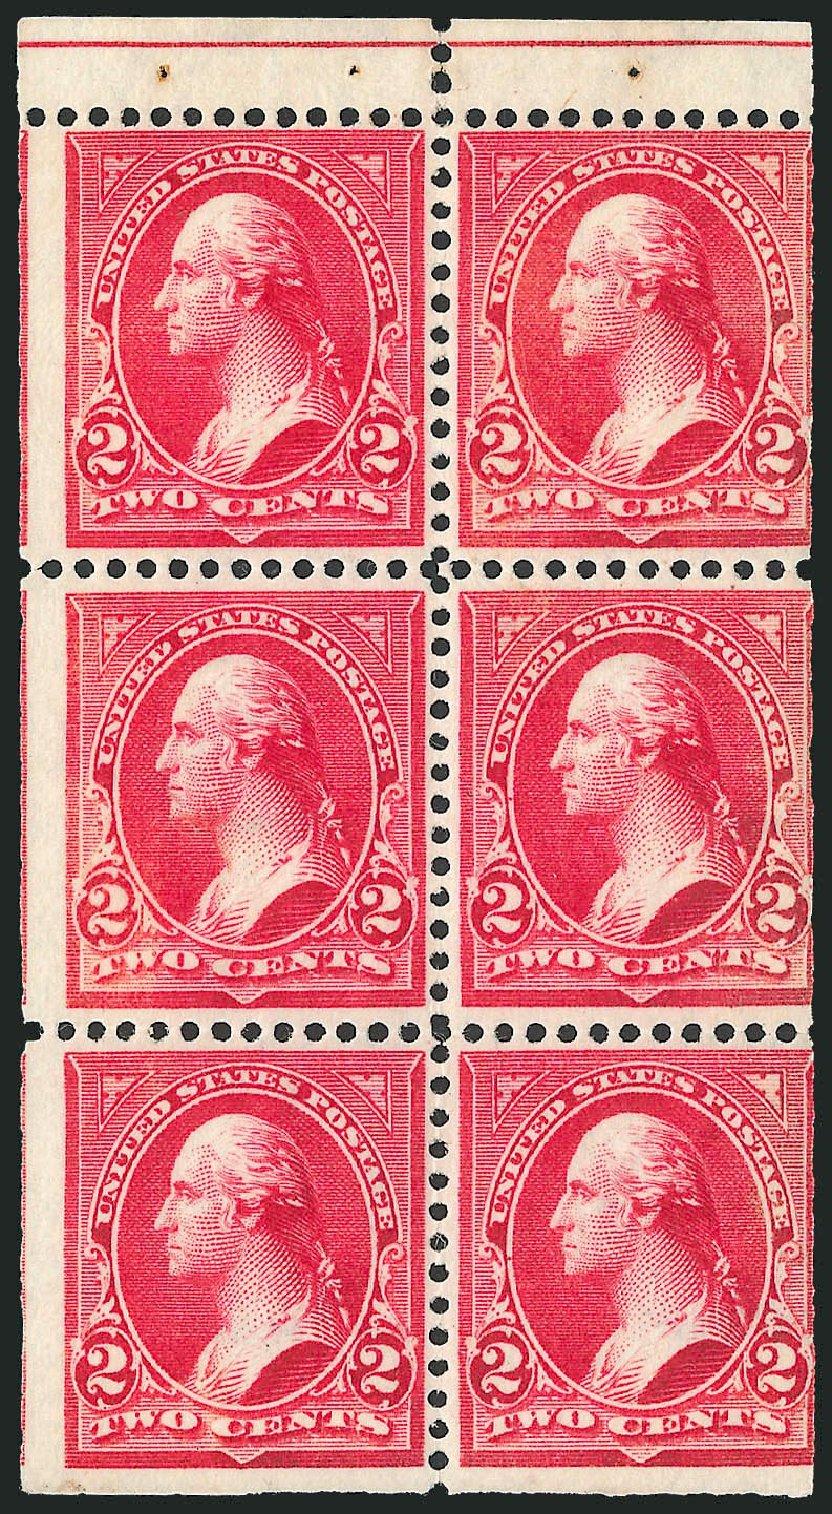 US Stamps Prices Scott Catalog 279B: 2c 1897 Washington. Robert Siegel Auction Galleries, Mar 2014, Sale 1067, Lot 1296